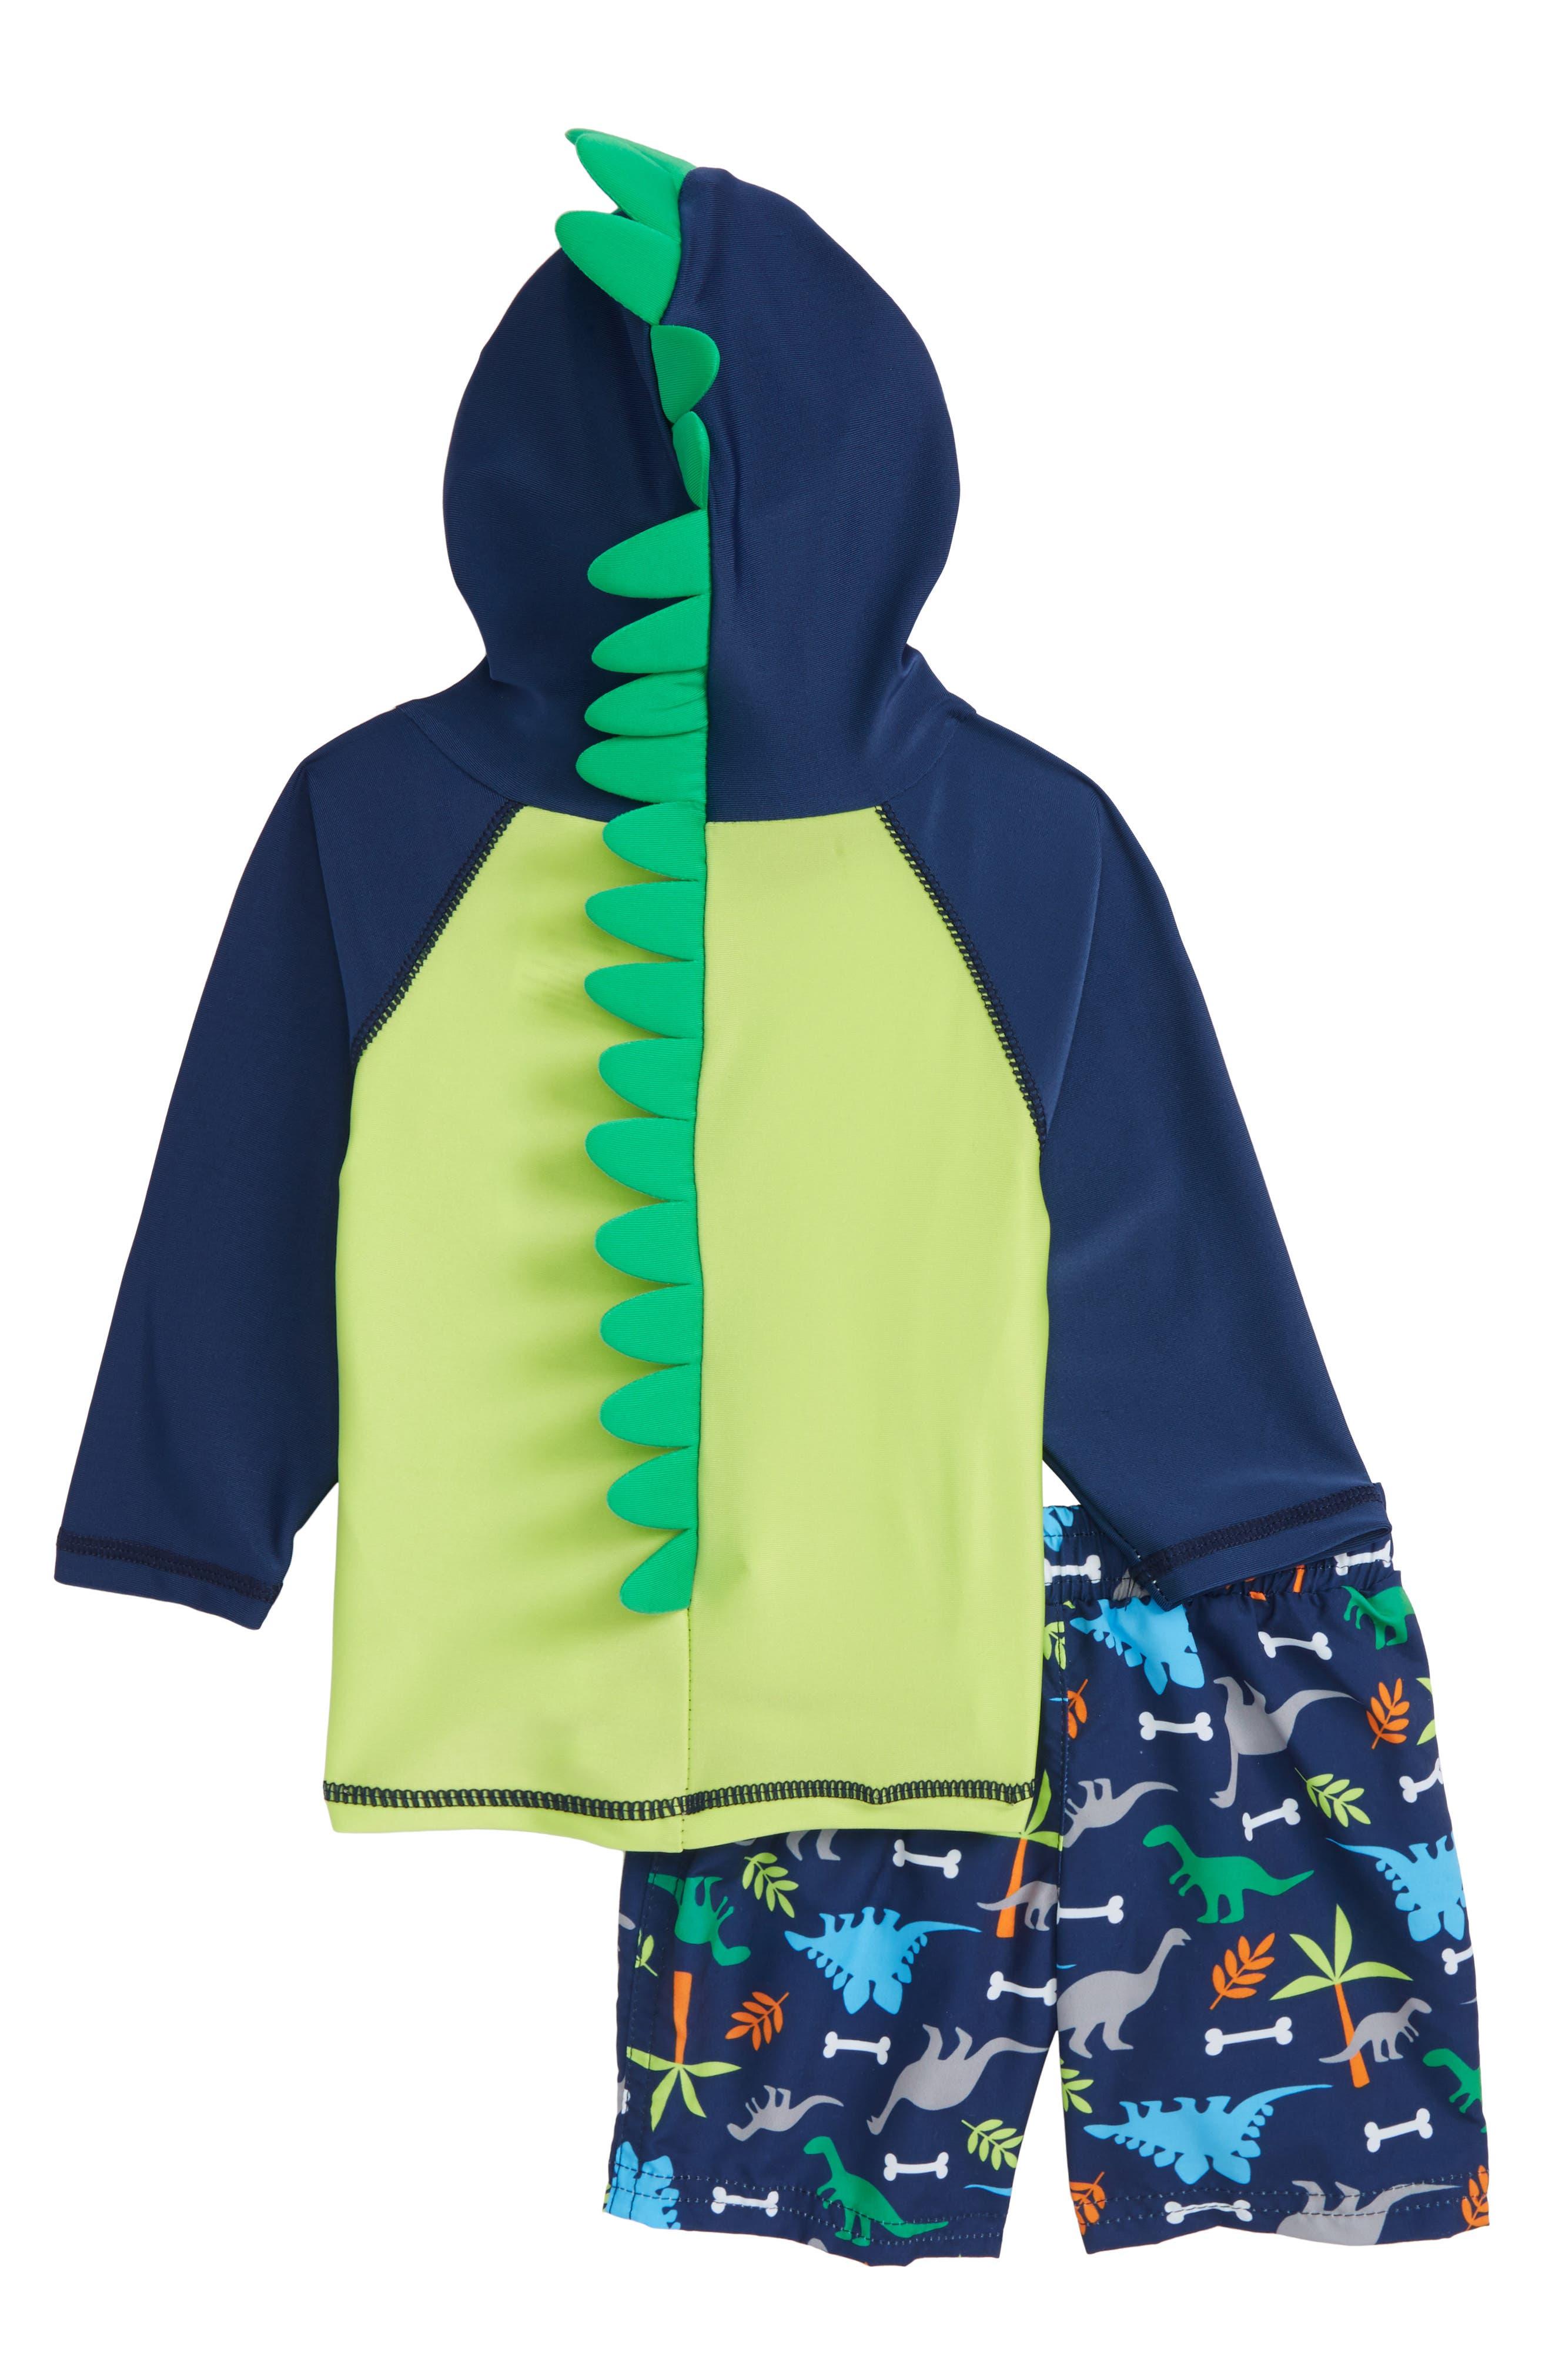 Little Dino Hooded Rashguard & Board Shorts Set,                             Alternate thumbnail 2, color,                             Navy